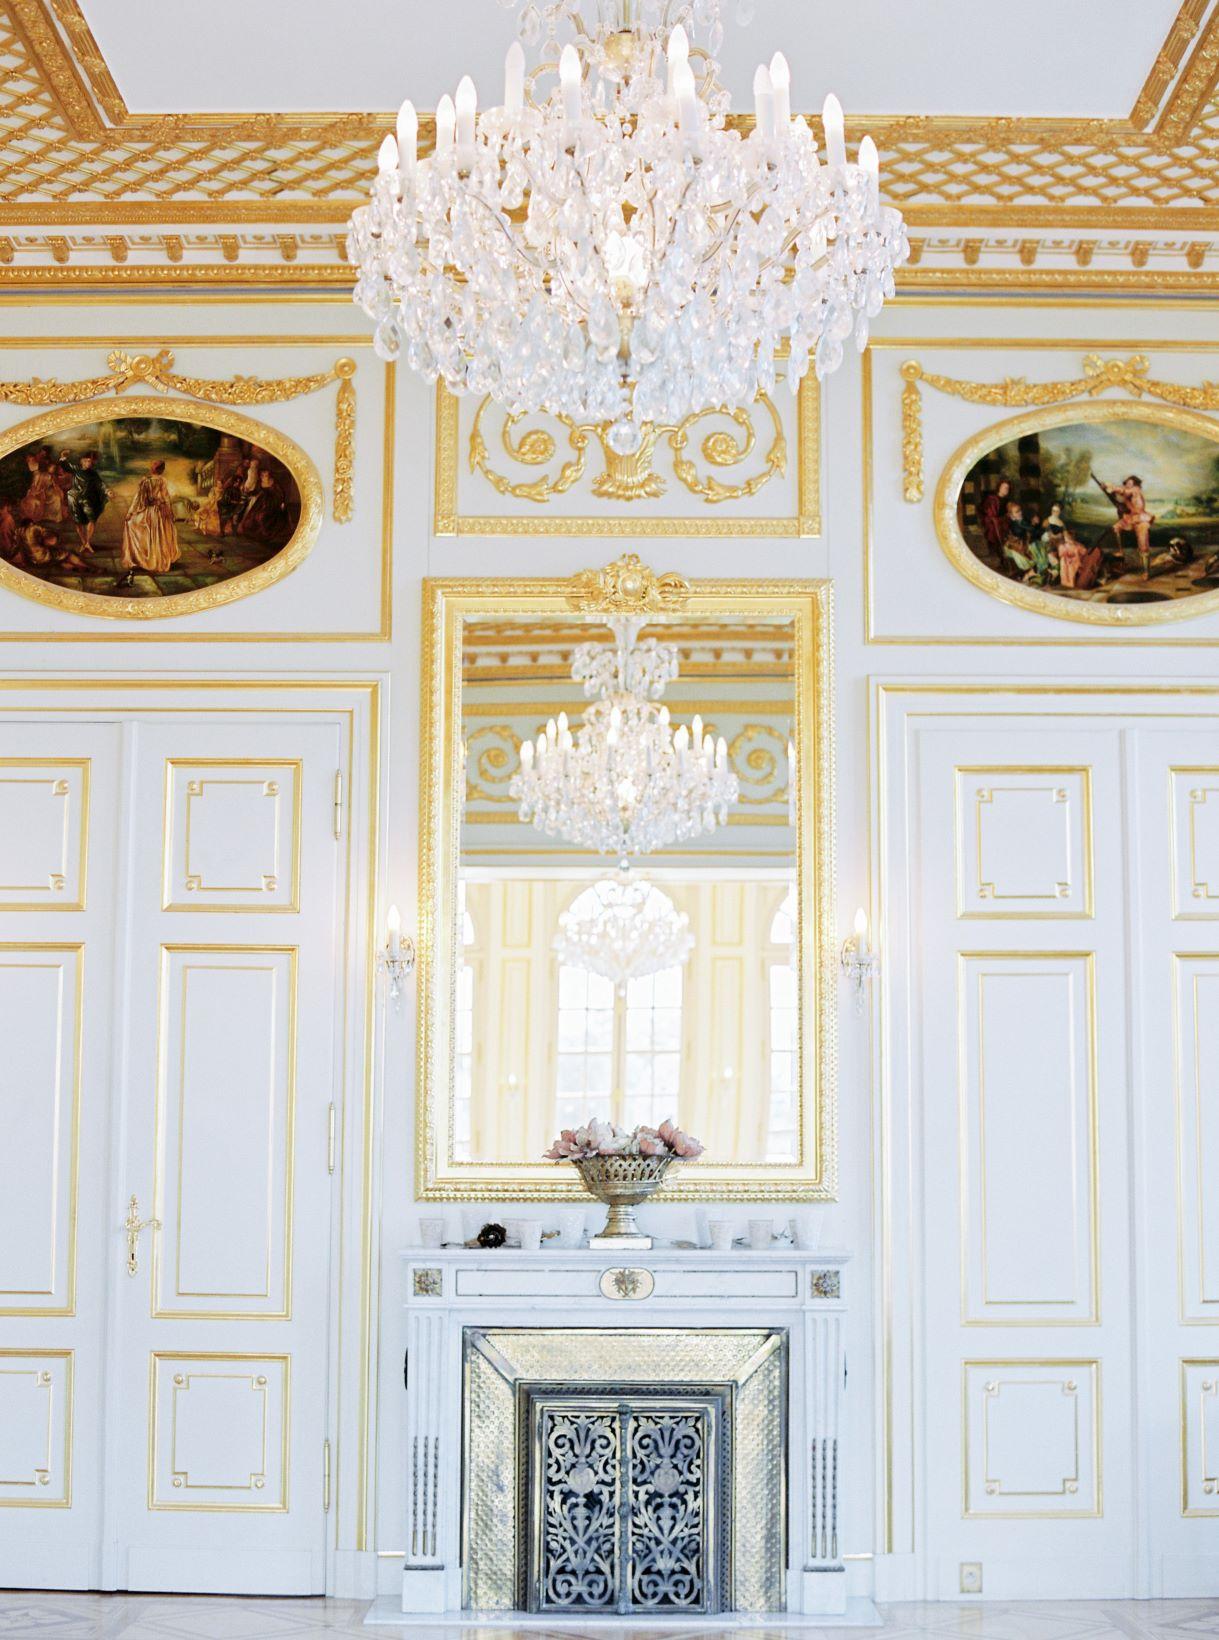 Christophe Serrano WhiteEdenWedding Chateau Saint georges-183 red